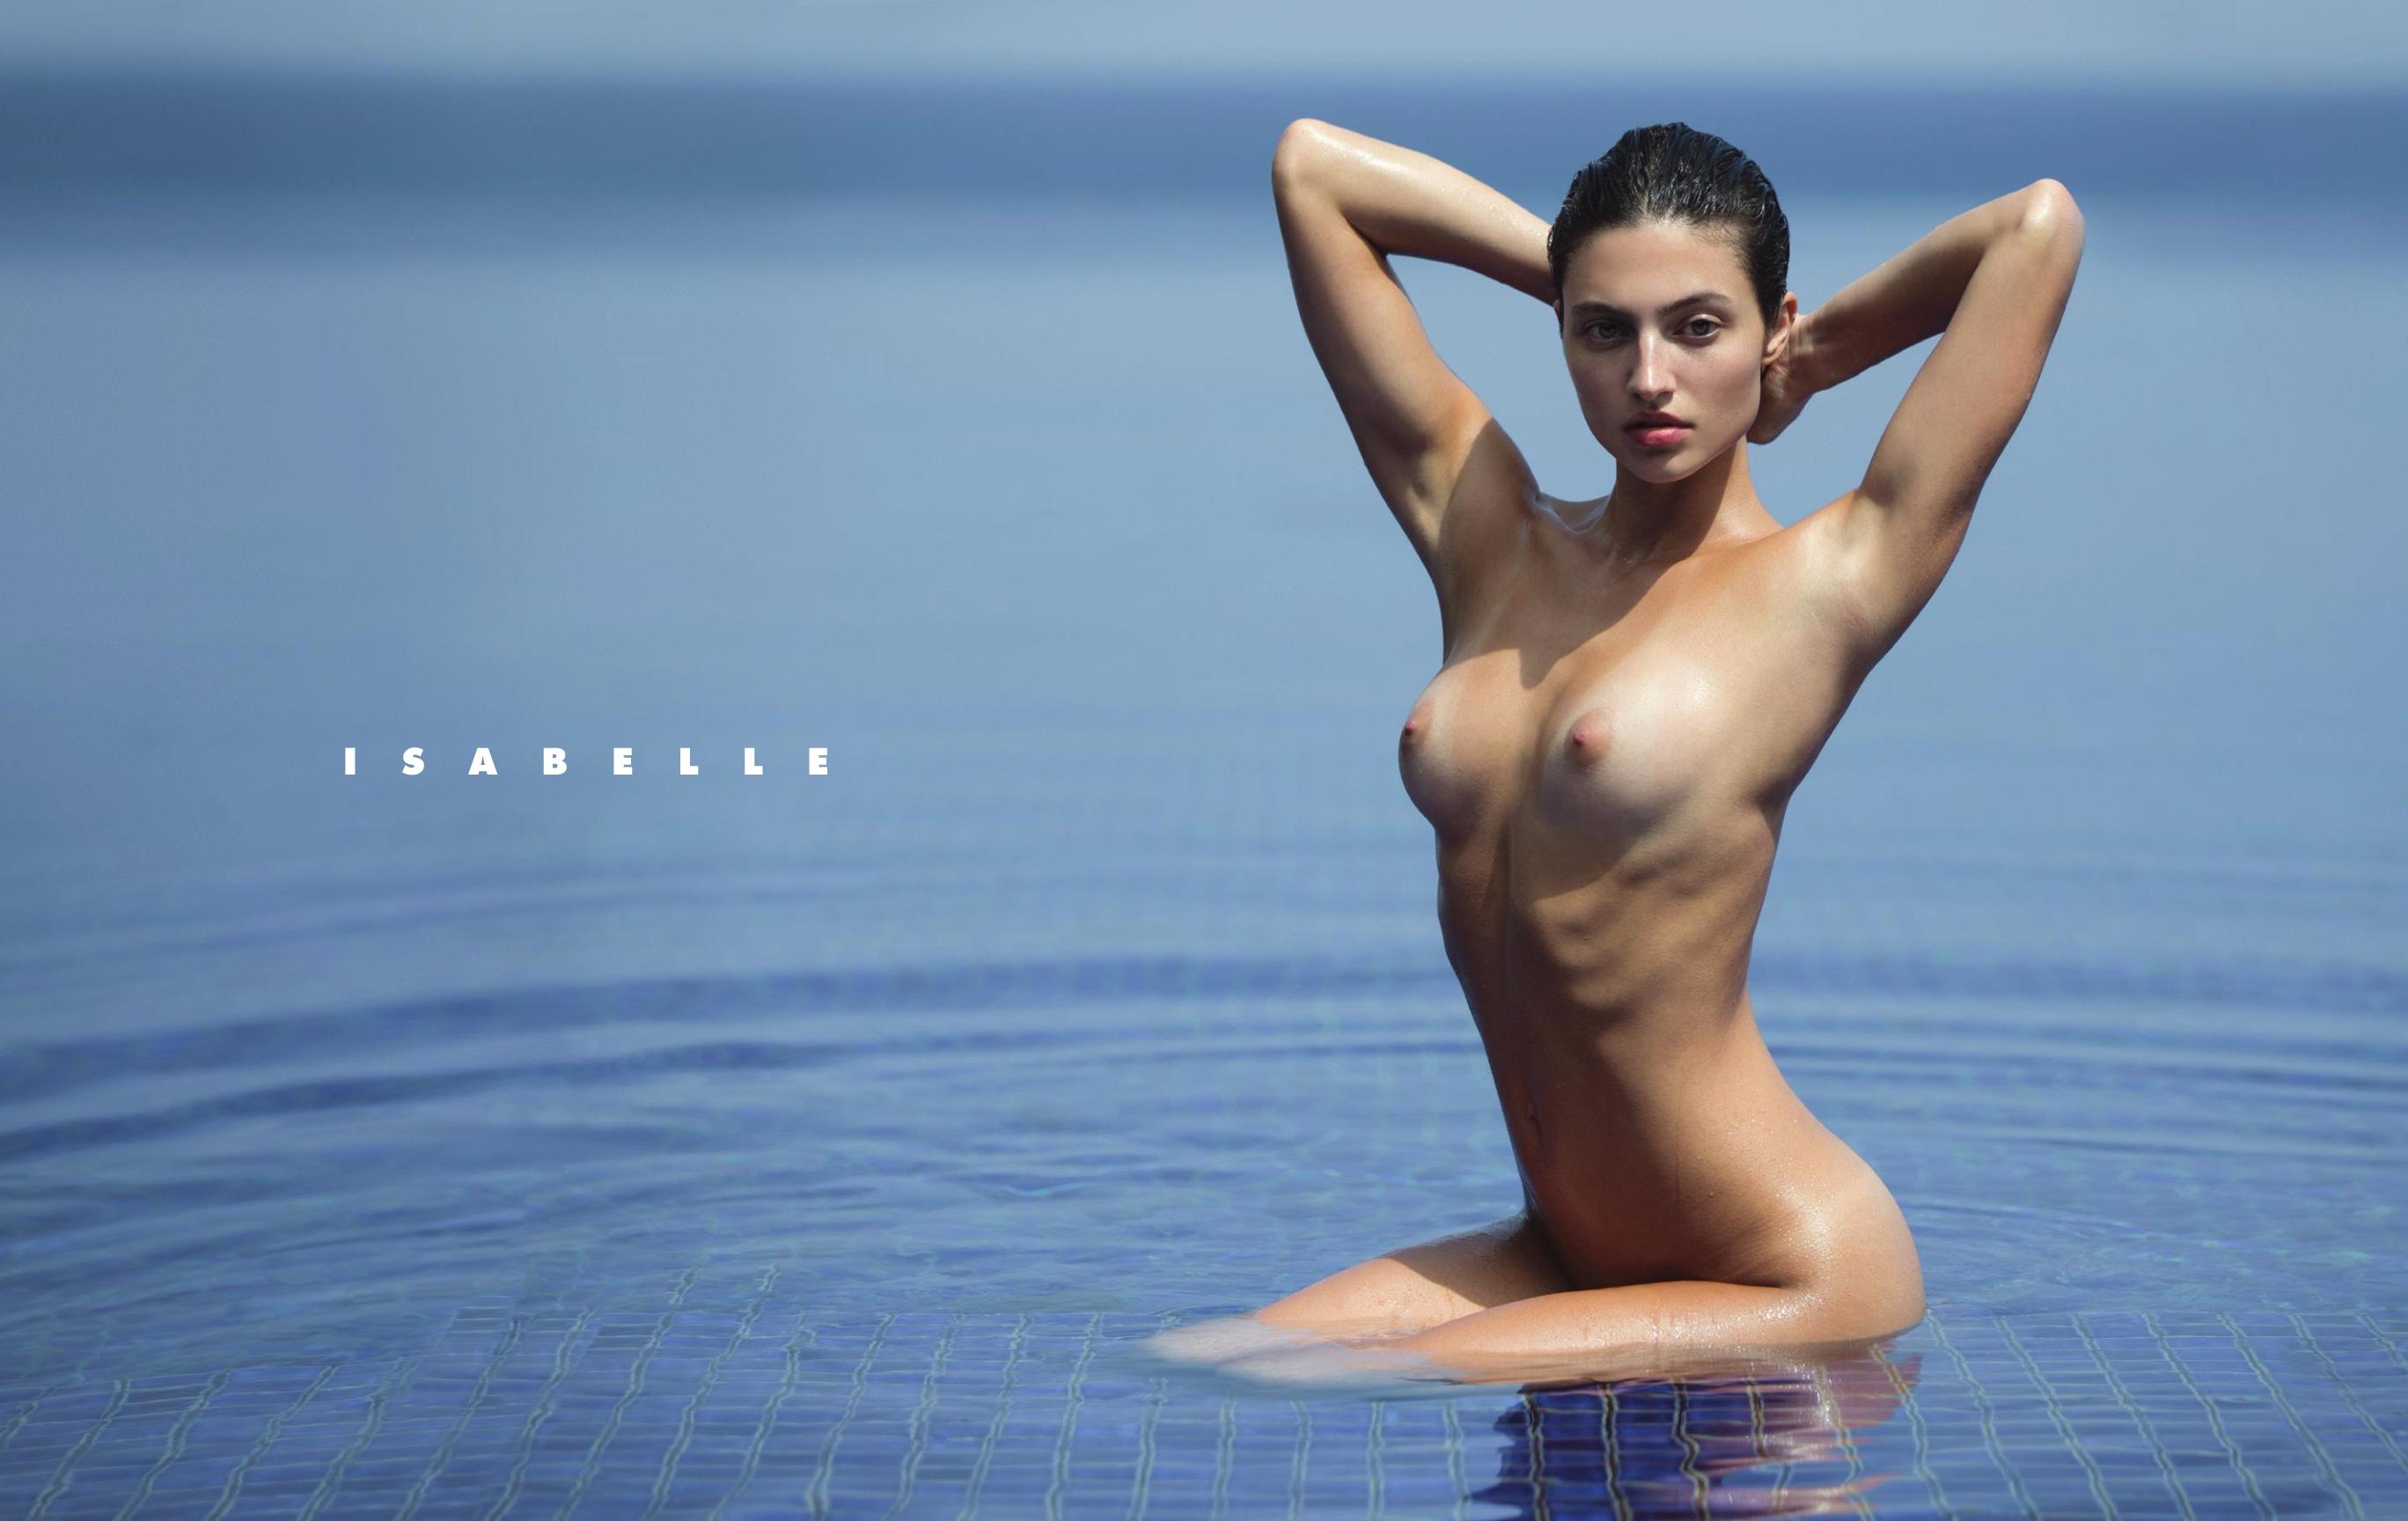 pics Isabelle Boemeke Nude - 9 Photos